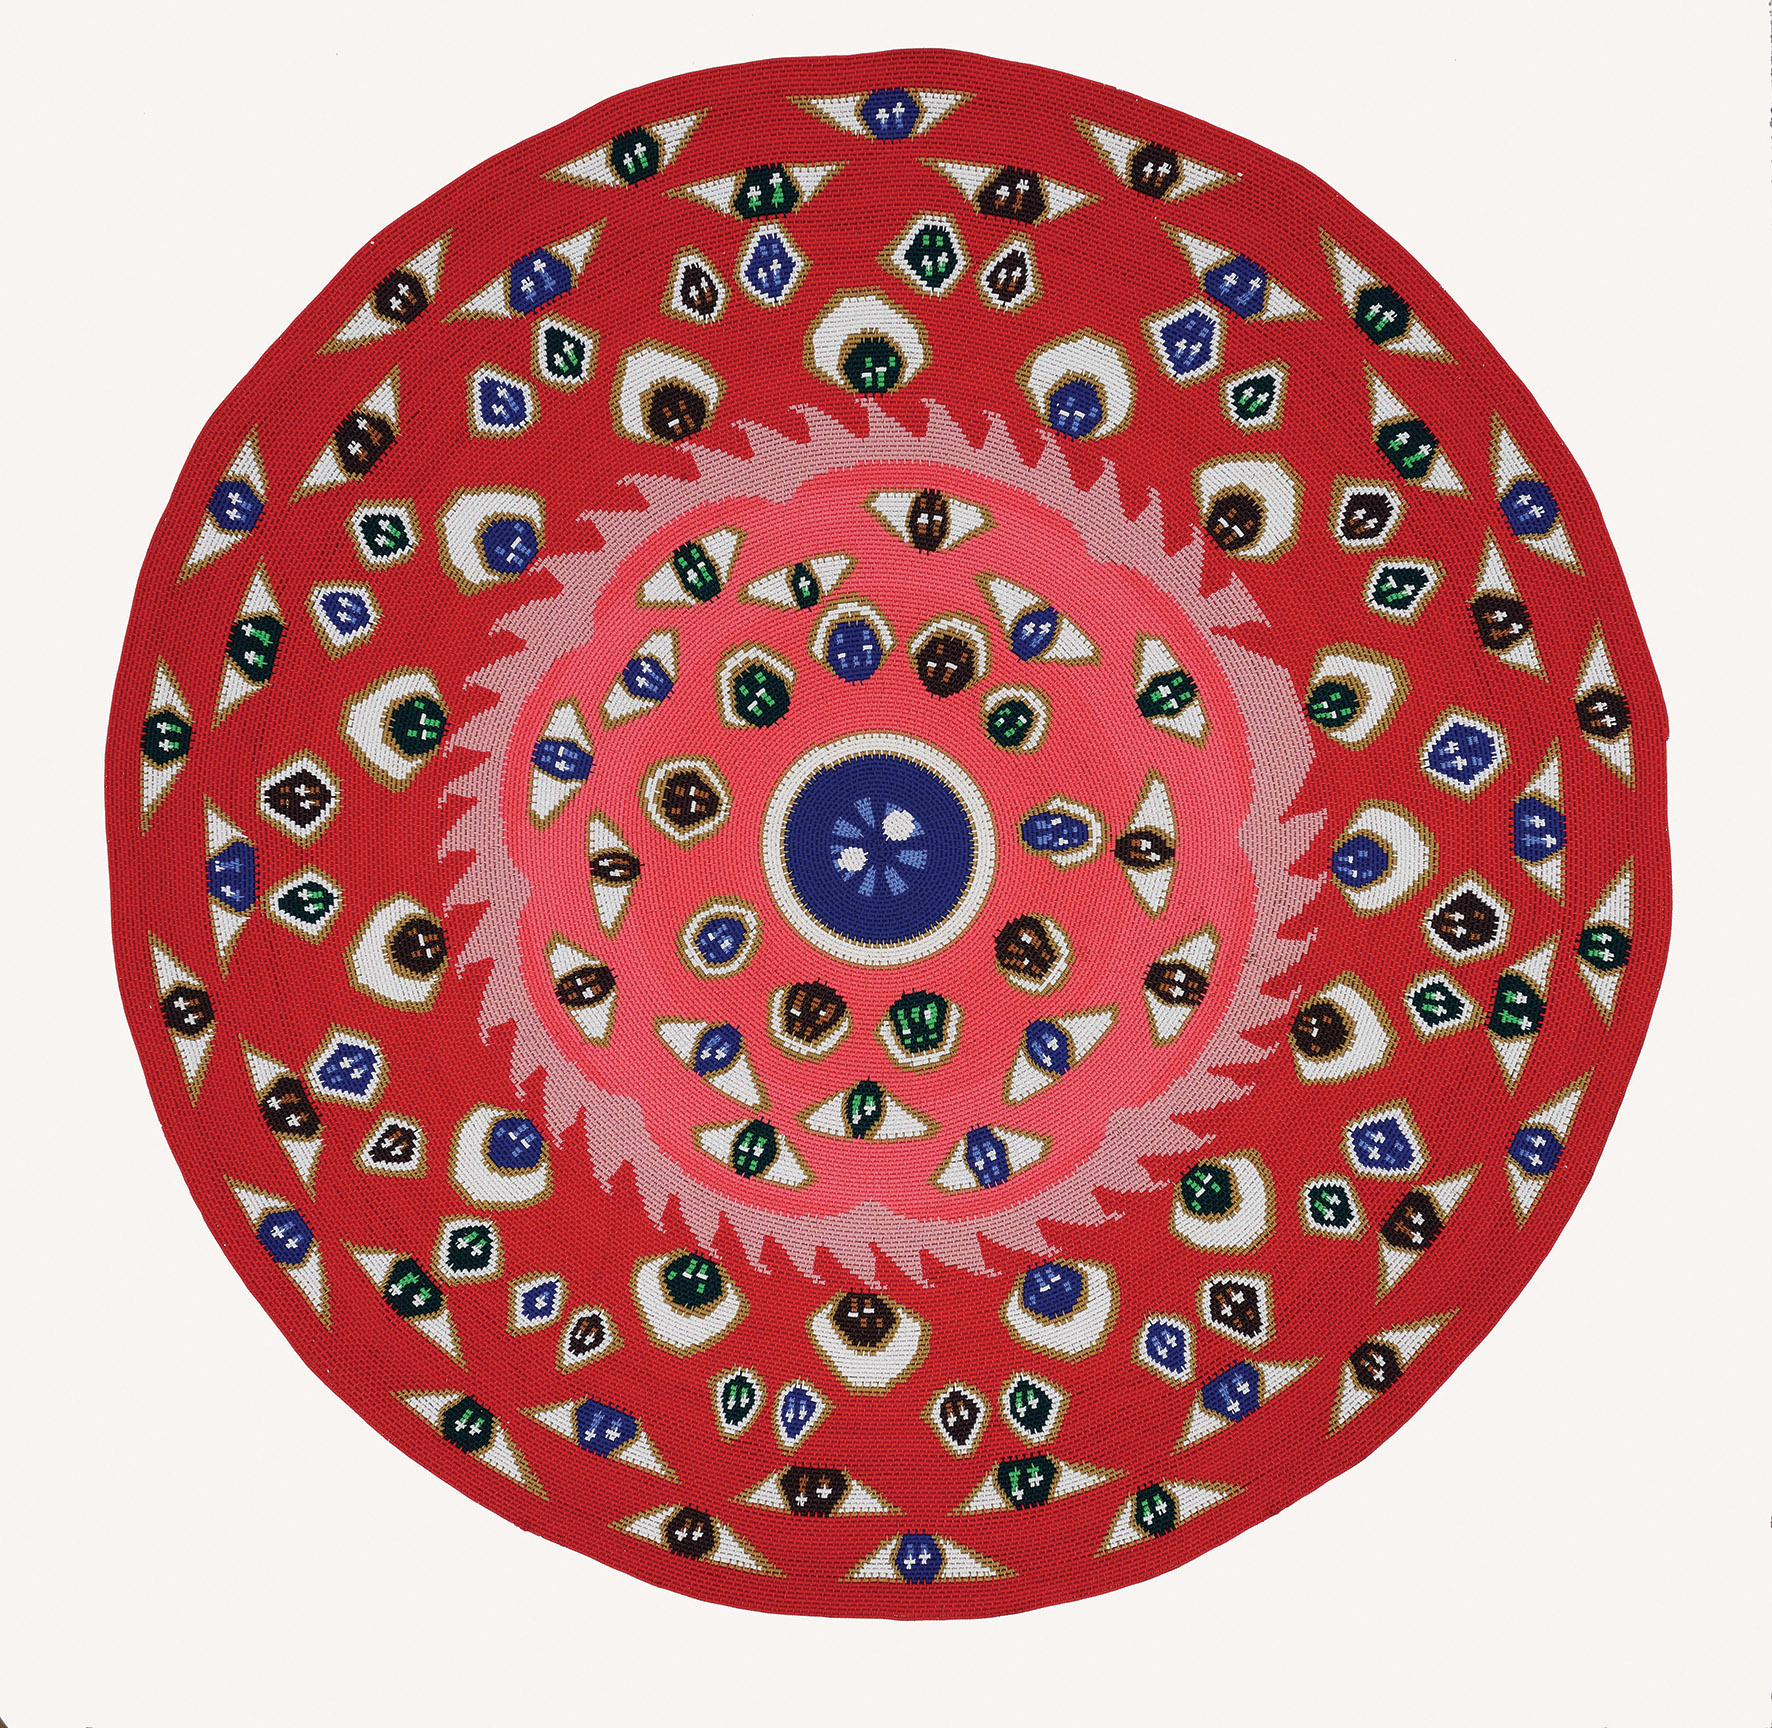 Hervé Di Rosa, Around the Eye in One Day. Câbles de téléphone tressés, 2013